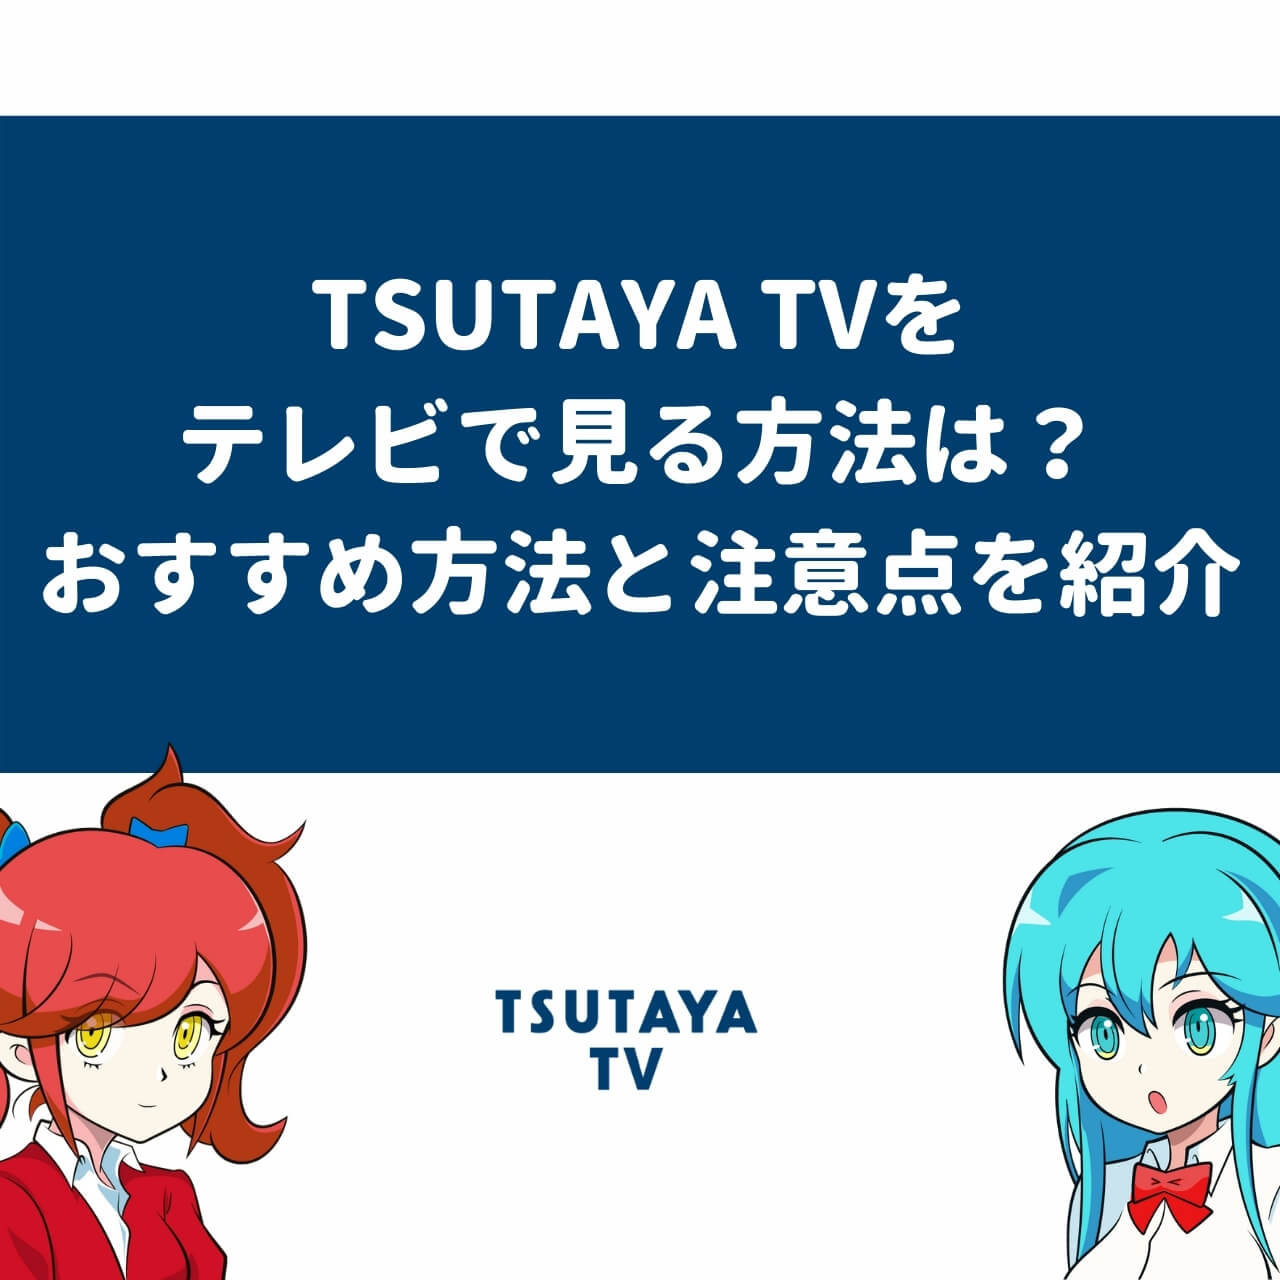 TSUTAYA TVをテレビで見る方法は?おすすめ方法と注意点を紹介